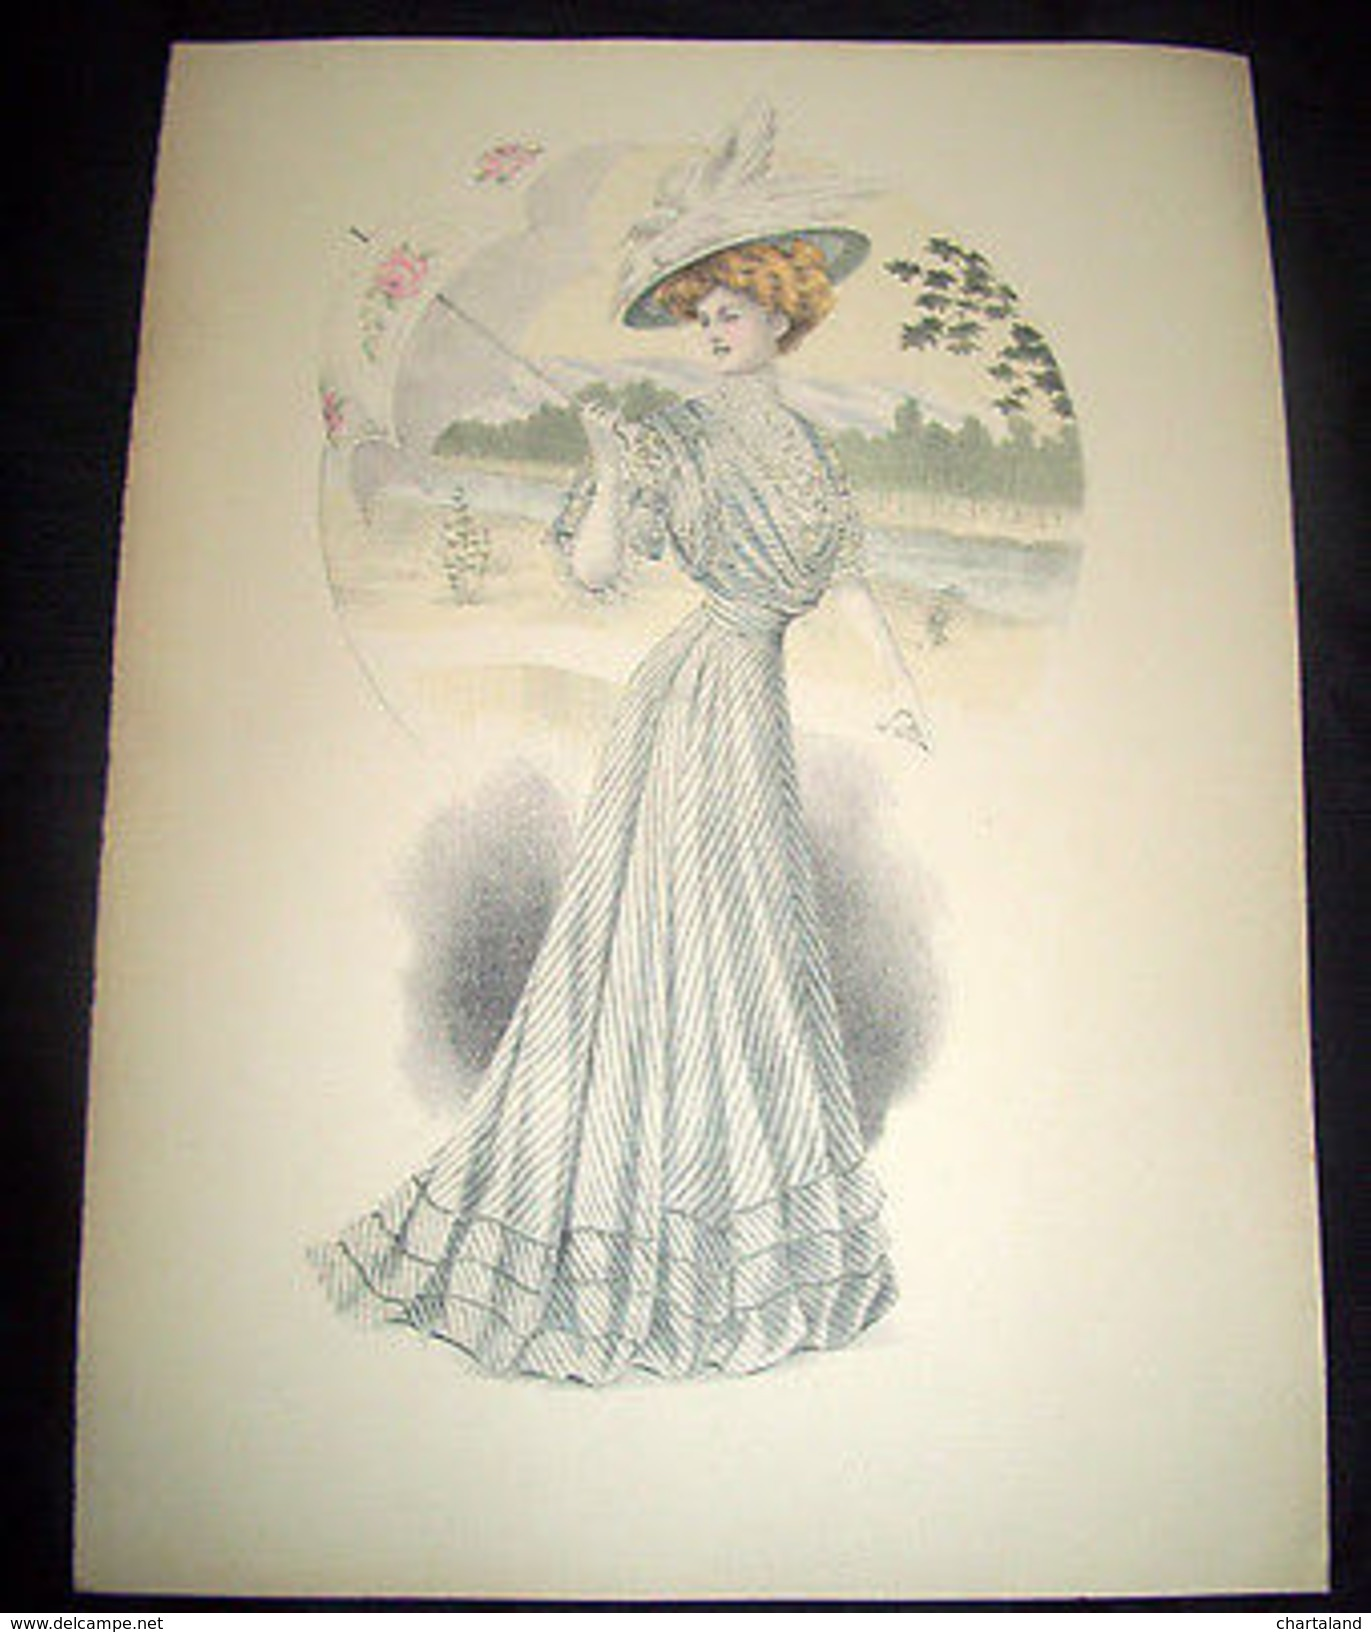 Stampa Litografia D' Epoca Originale - Moda Abiti Donna B04 - 1900 Ca - Stampe & Incisioni